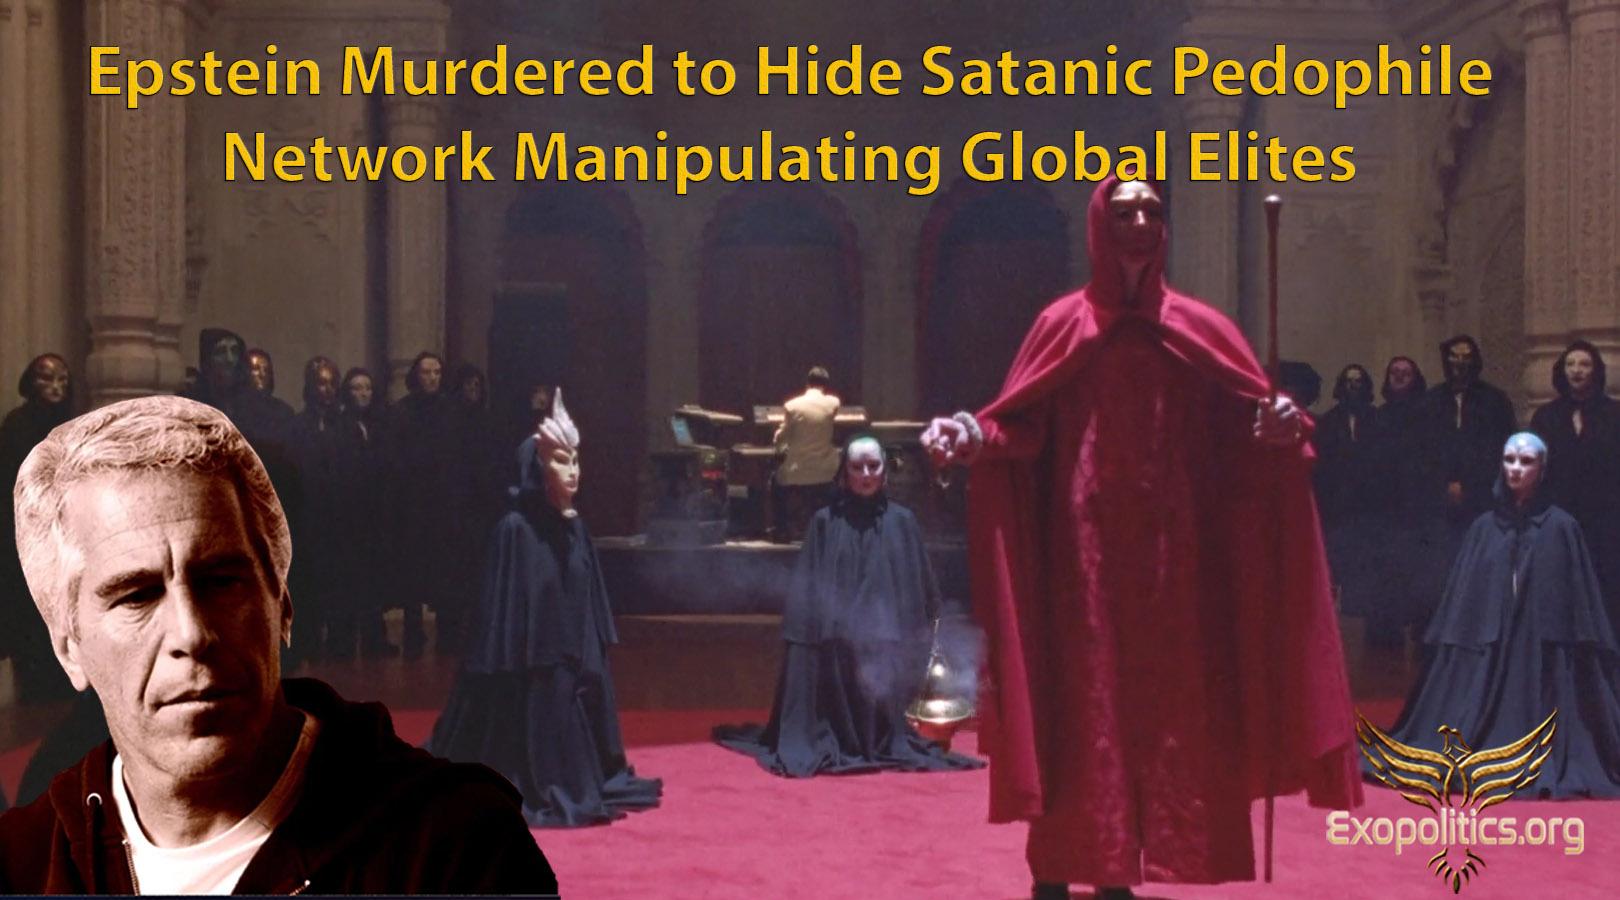 Epstein Murdered to Hide Satanic Pedophile Network Manipulating Global Elites